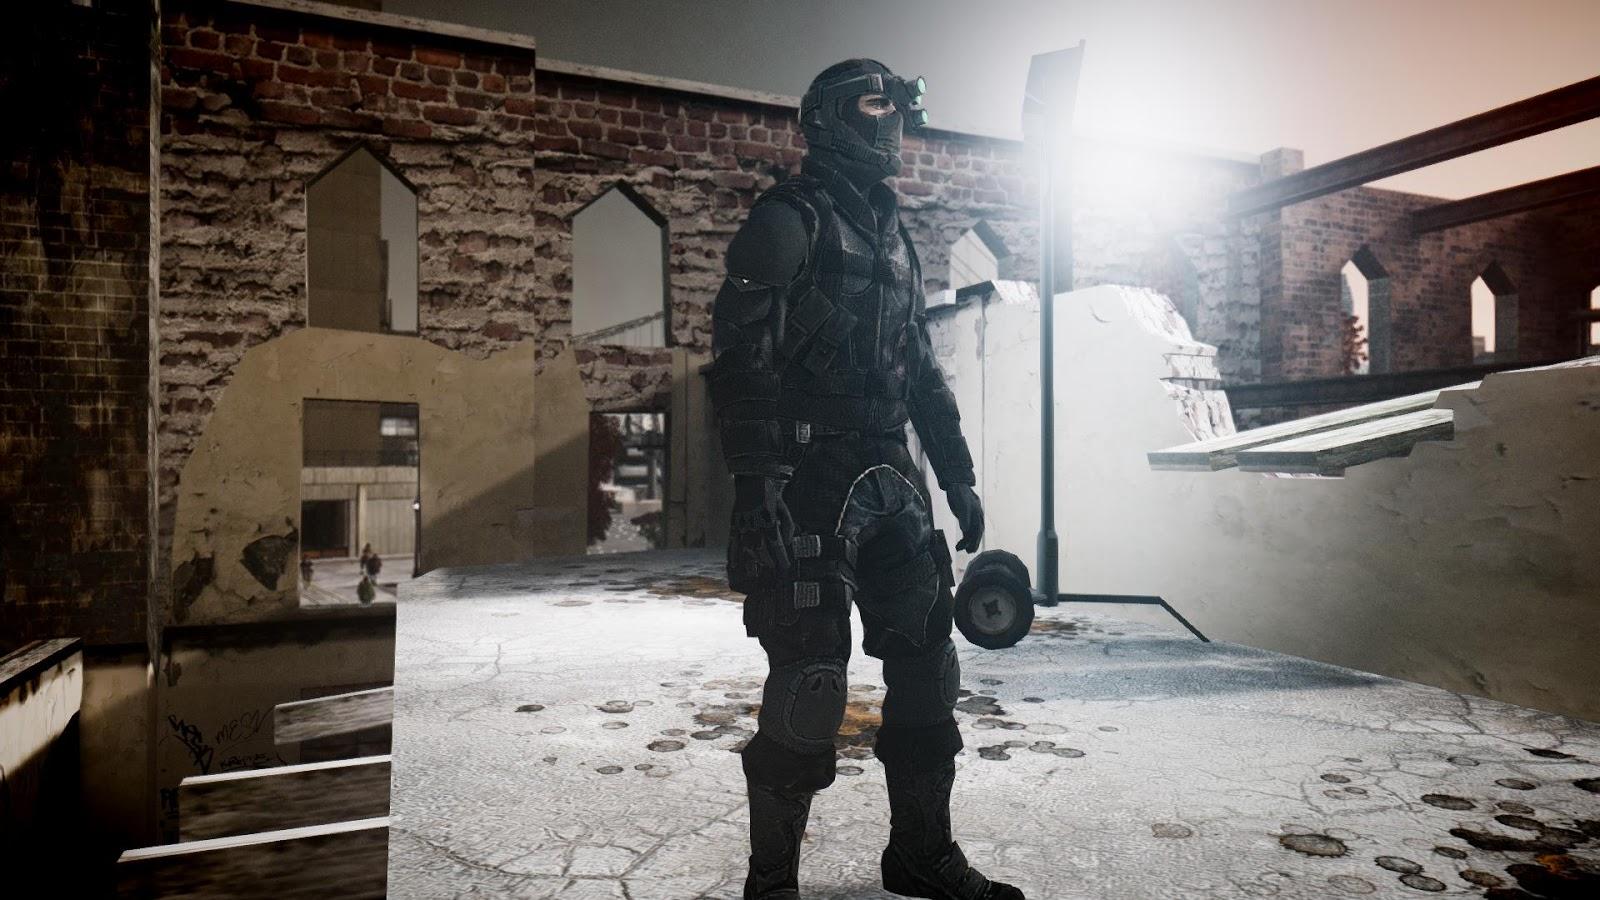 GTA 5,GTAV,GTA IV Mods and Skins: GTA IV MOD :Splinter Cell